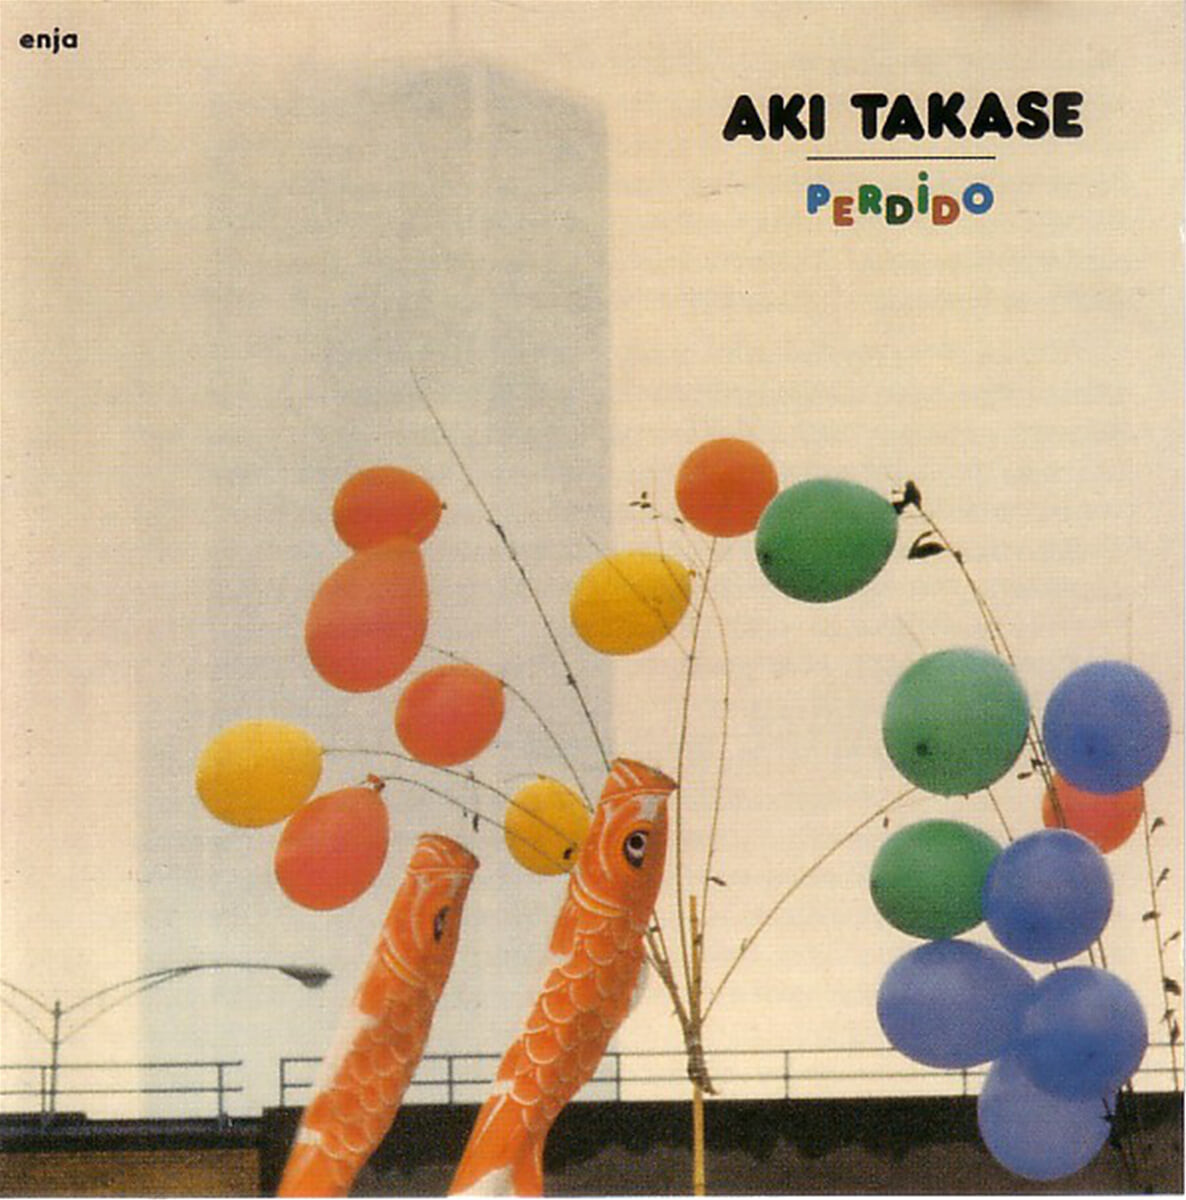 Aki Takase (아키 타카세) - Perdido